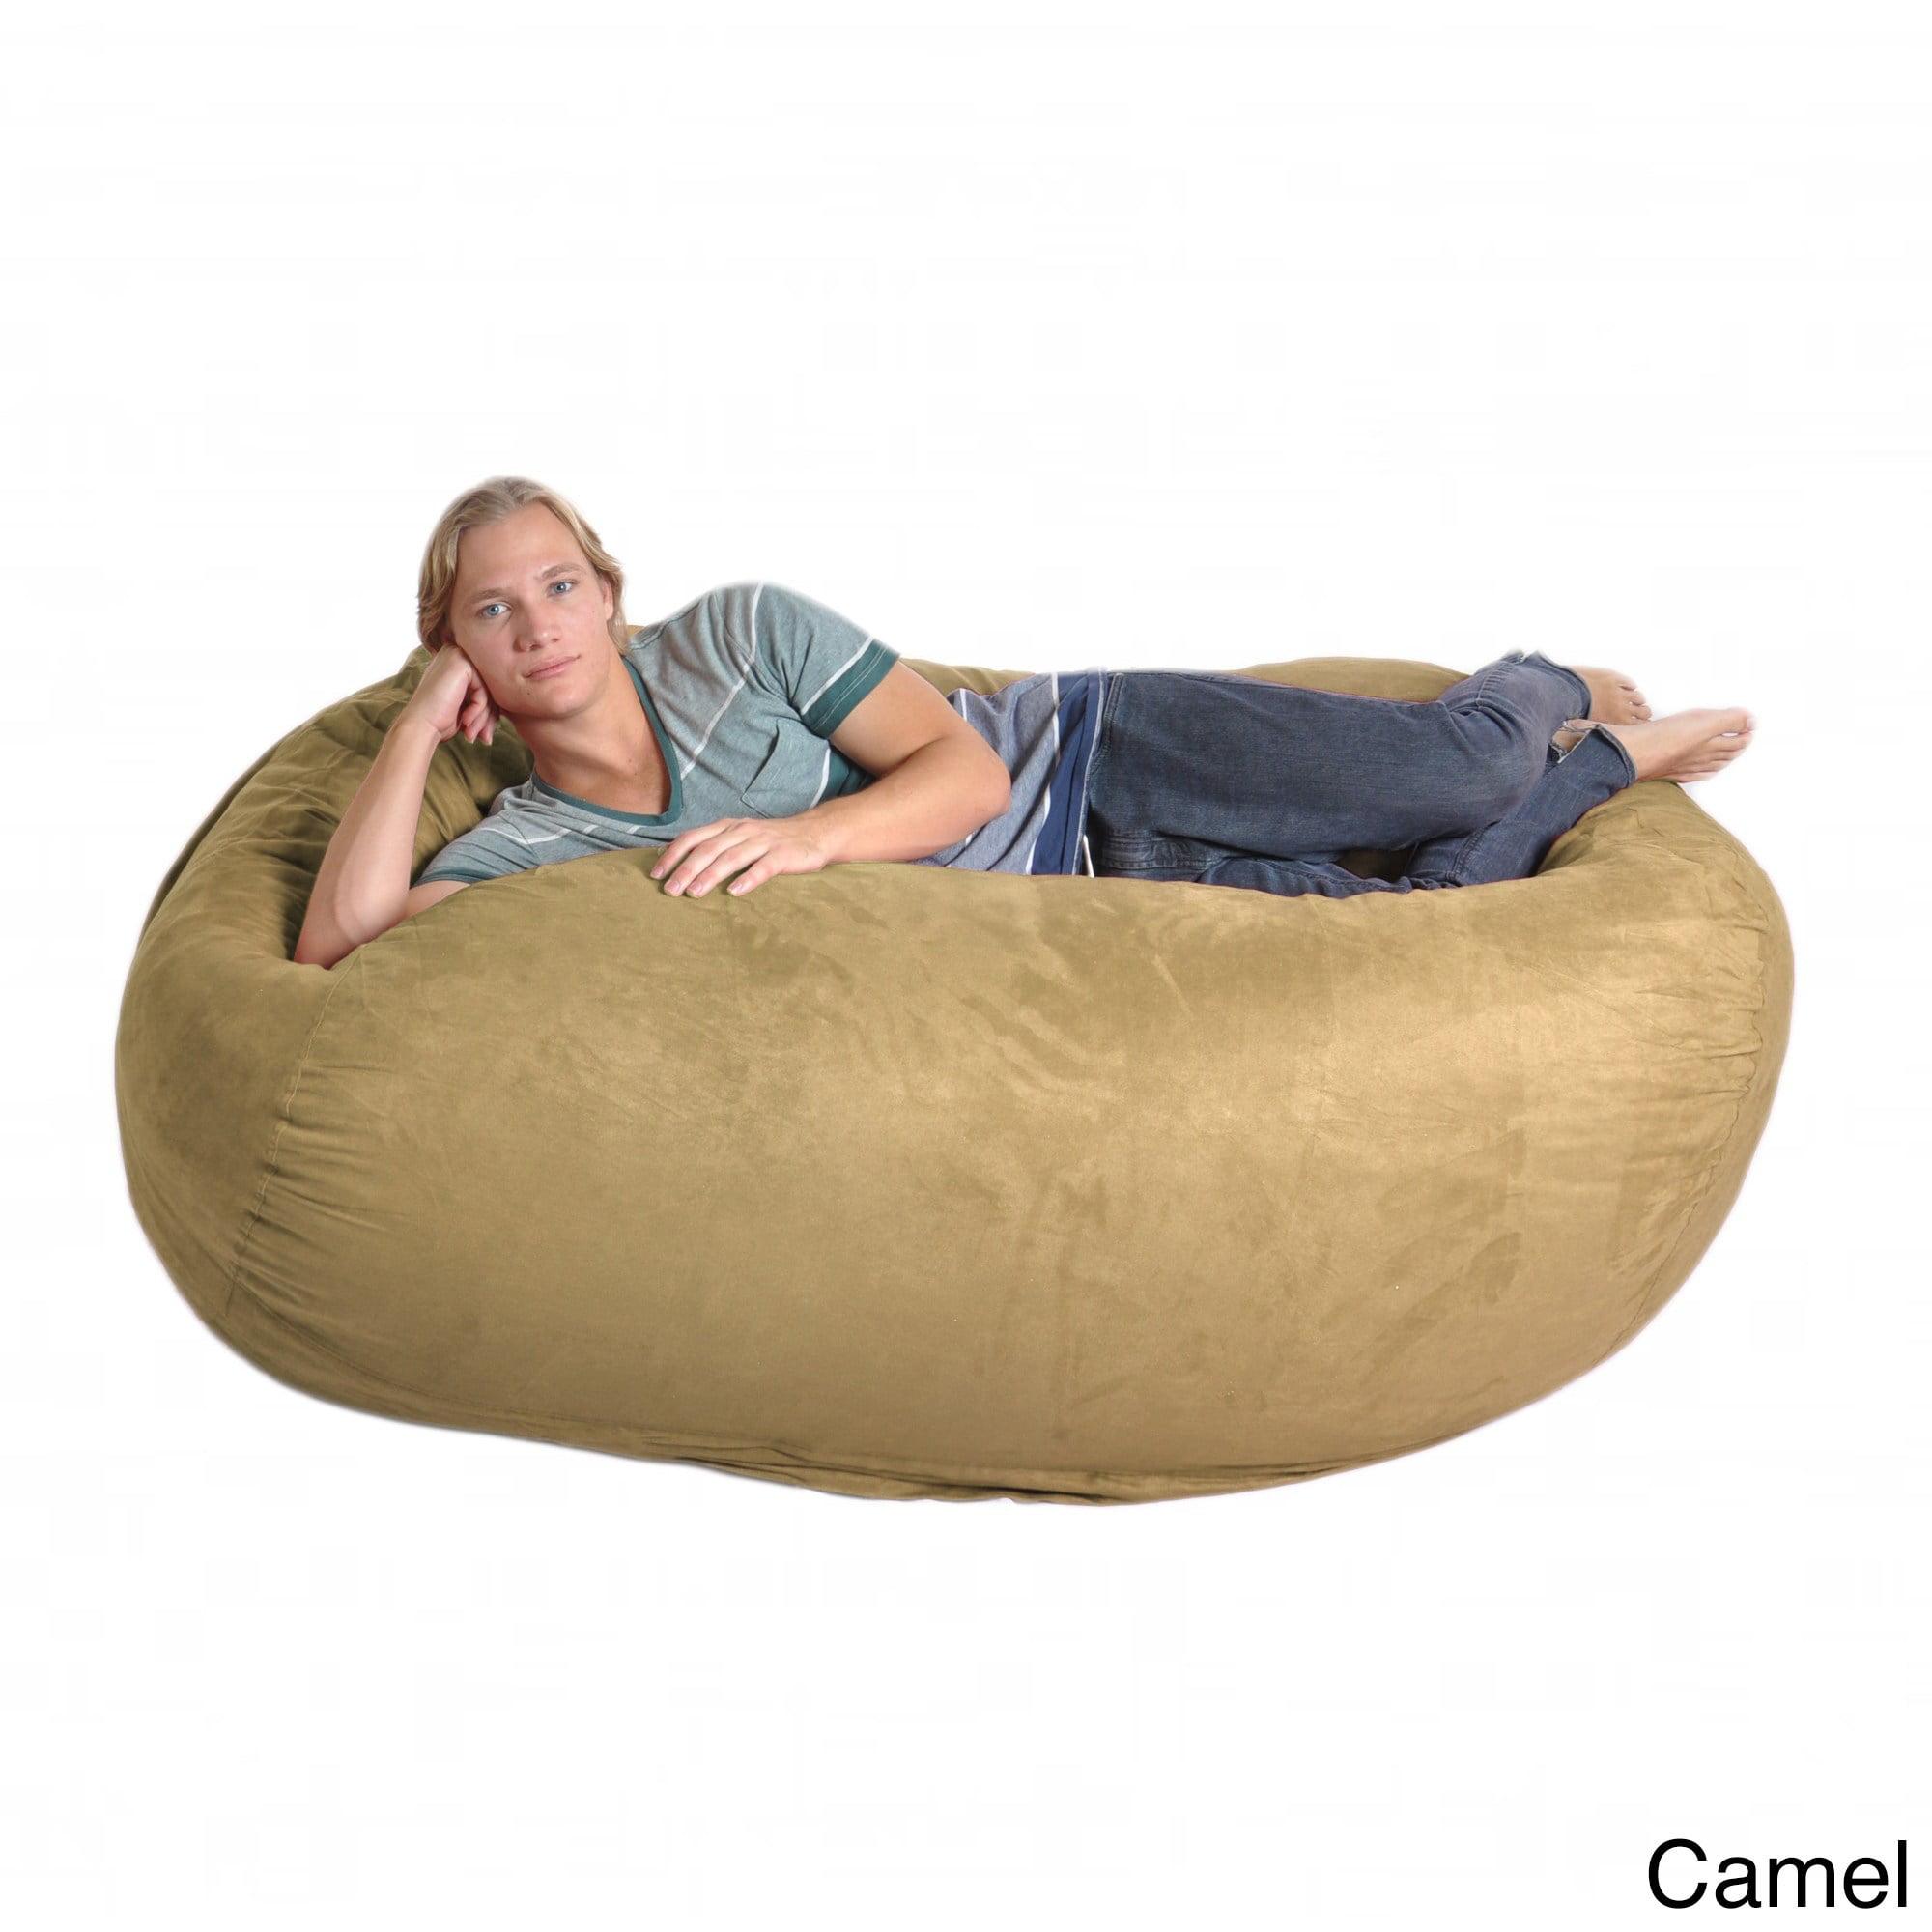 Slacker Sack  Oval 6-foot Microfiber/ Foam Bean Bag